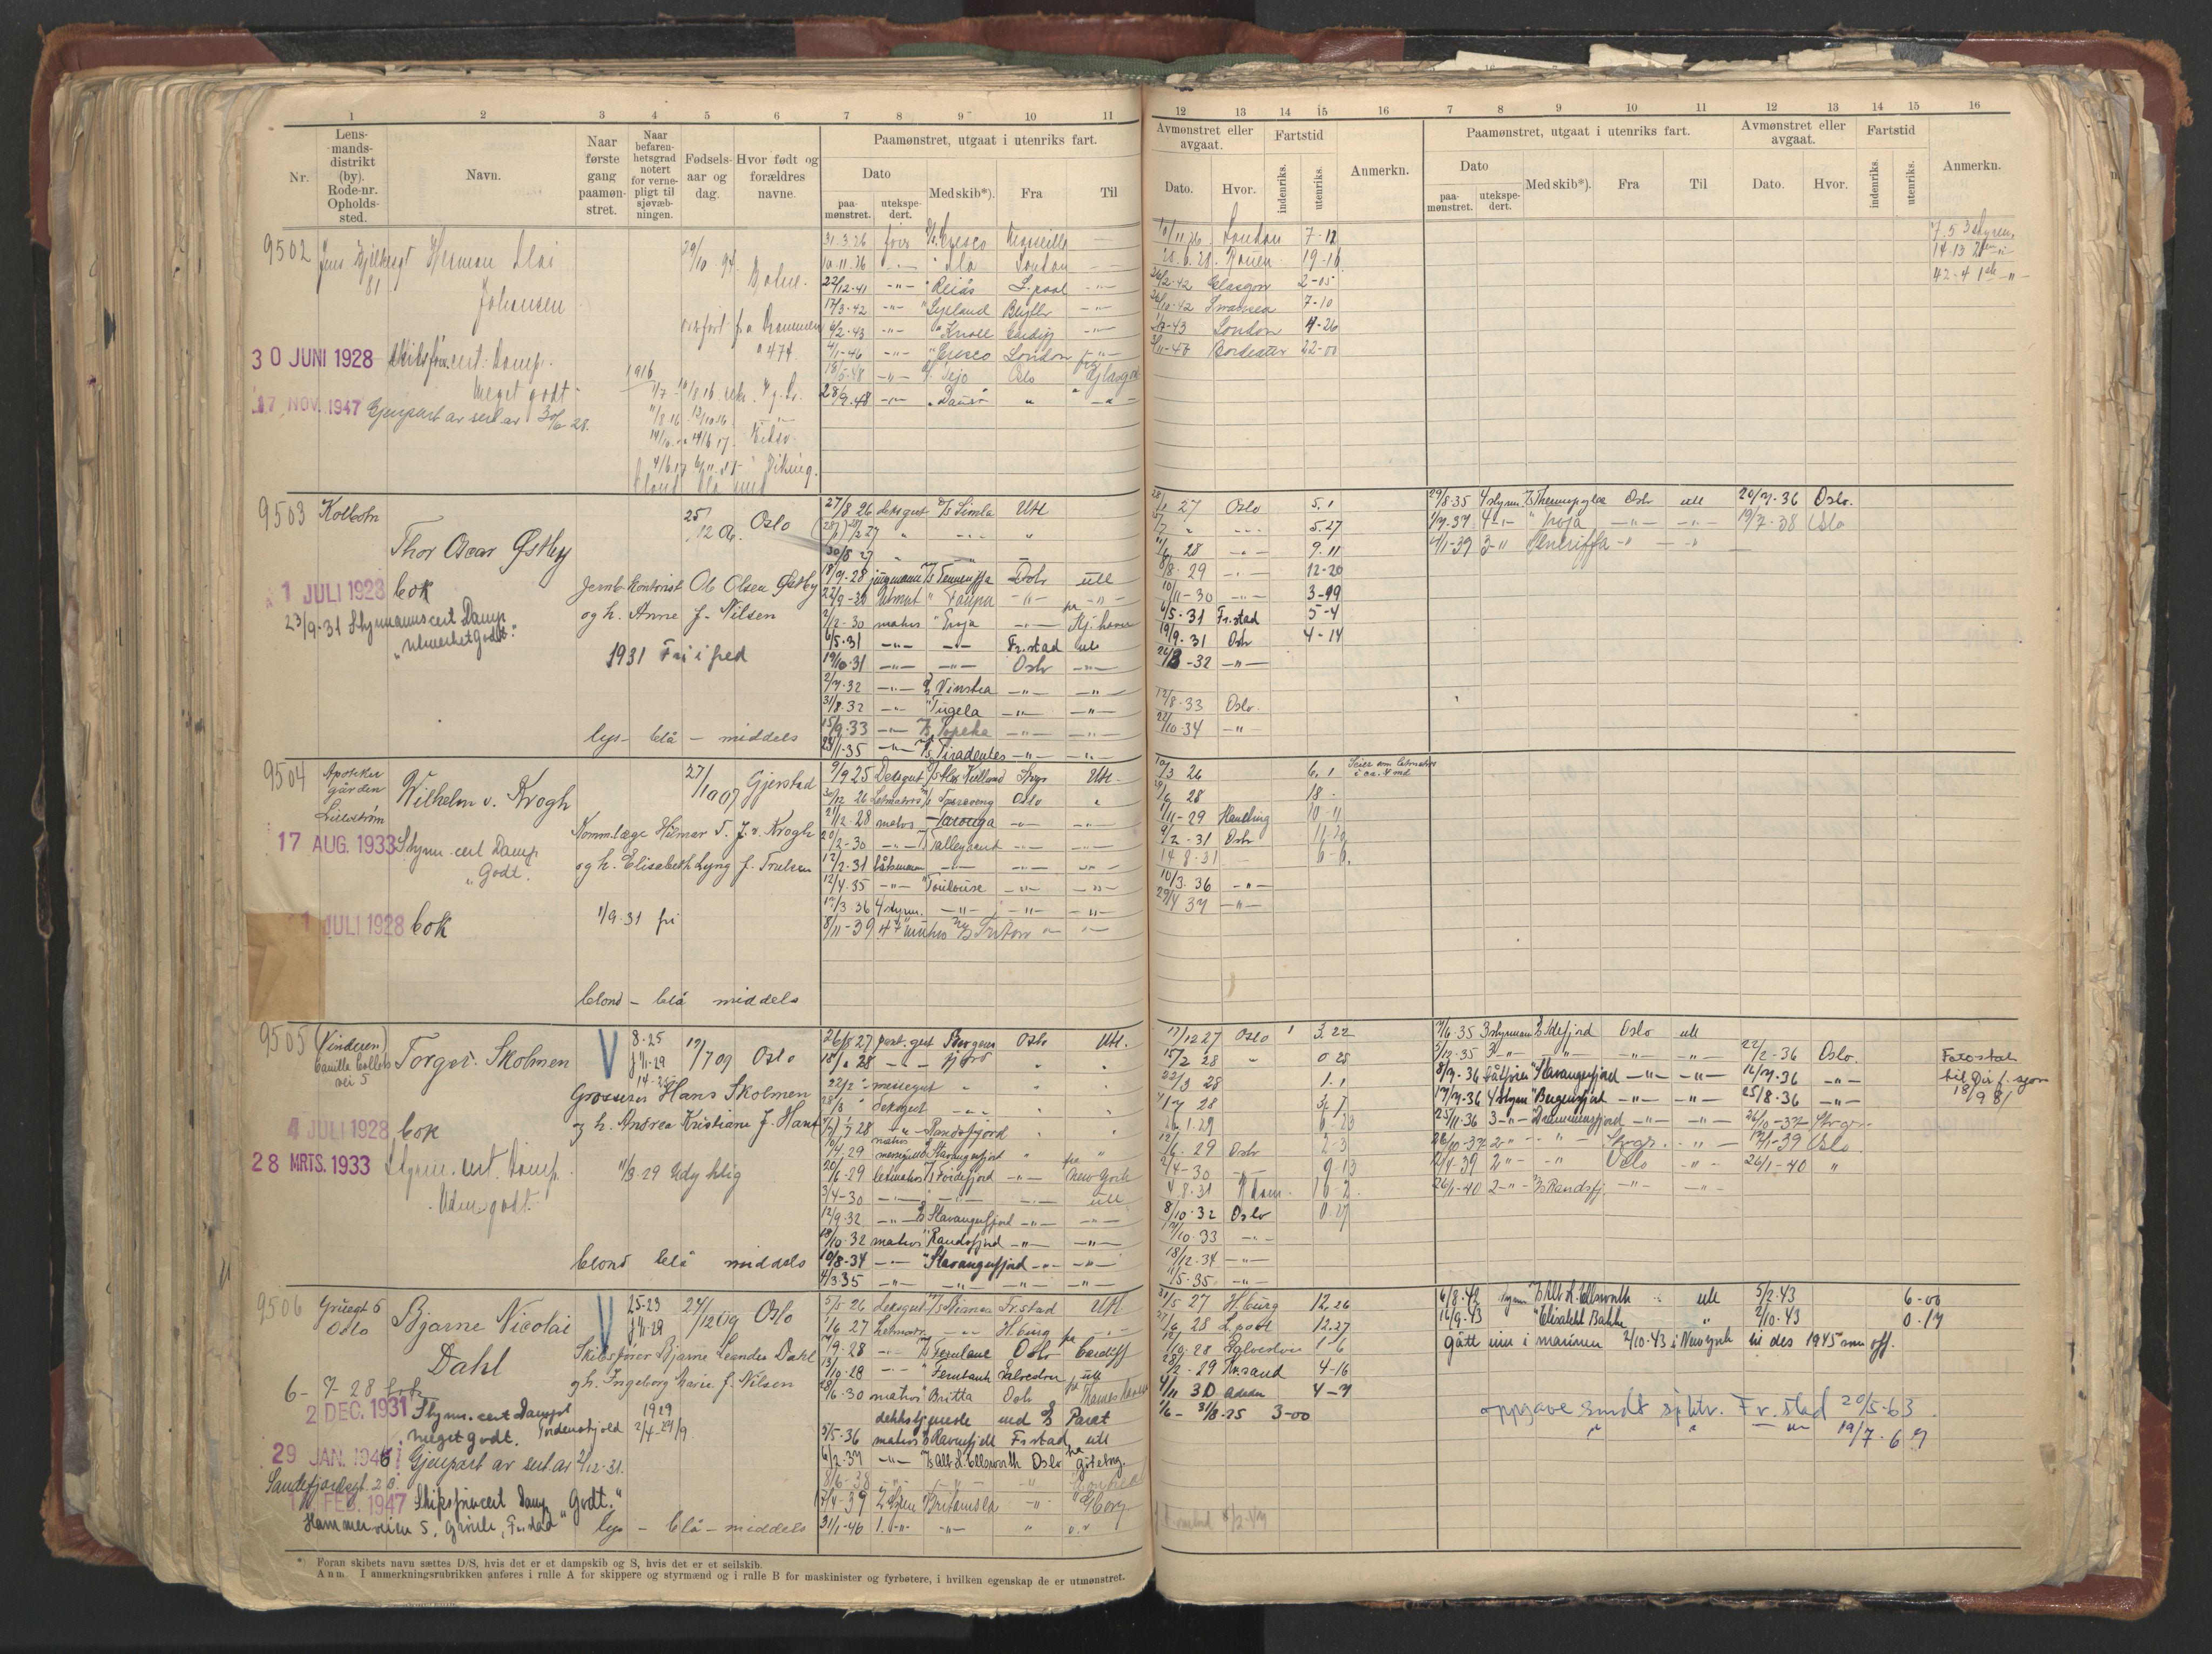 SAO, Oslo sjømannskontor, F/Fc/L0006: Hovedrulle, 1918-1930, s. 394